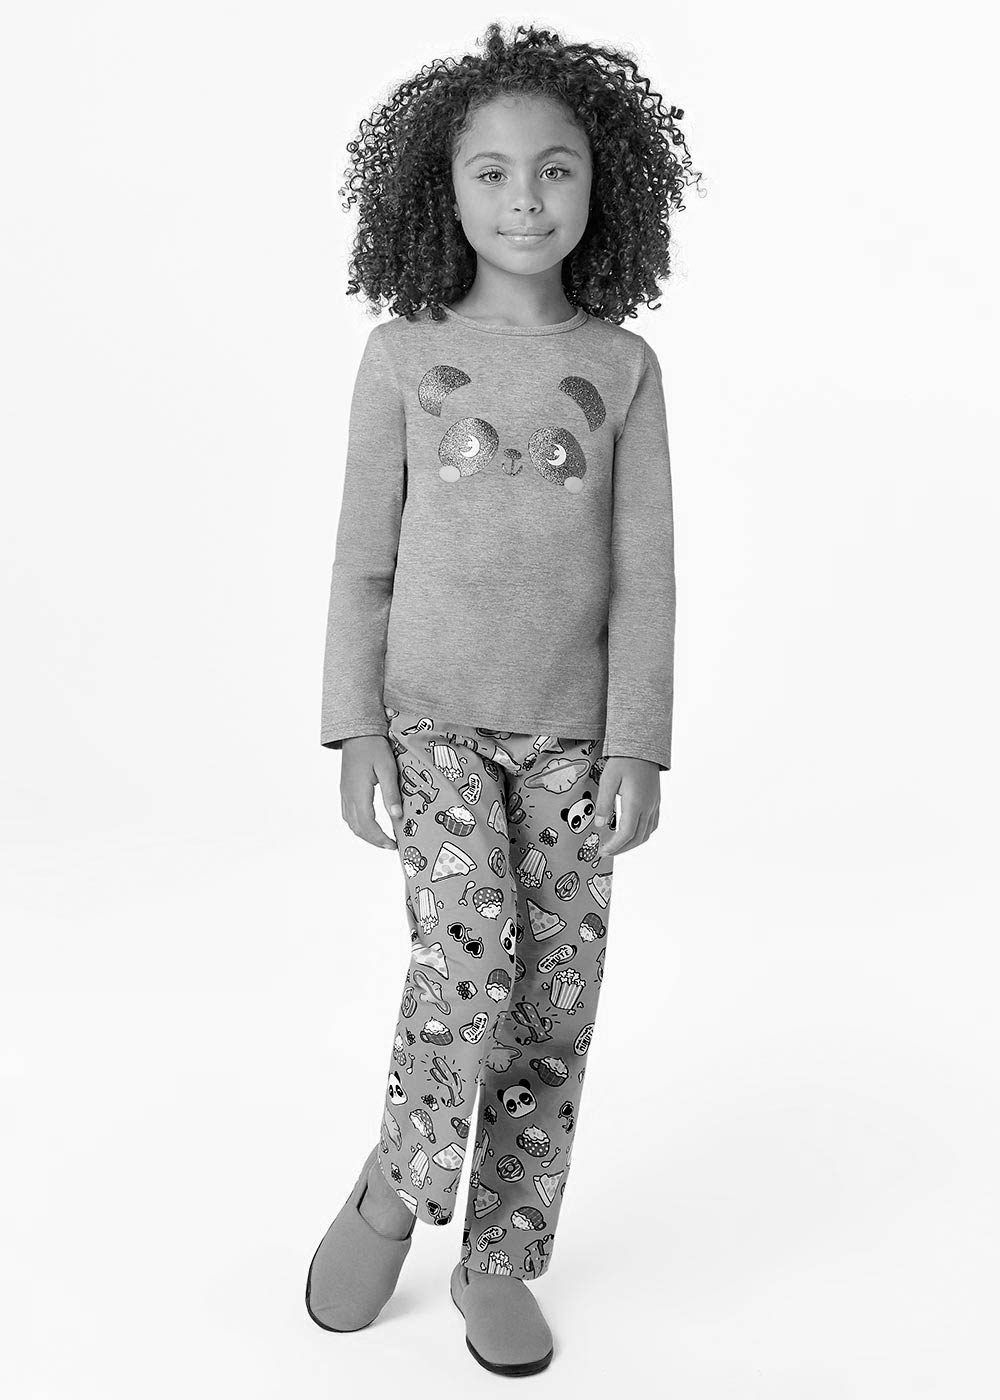 Pijama Infantil Inverno Feminino Cerejinha Cinza Mãe e Filha - Malwee